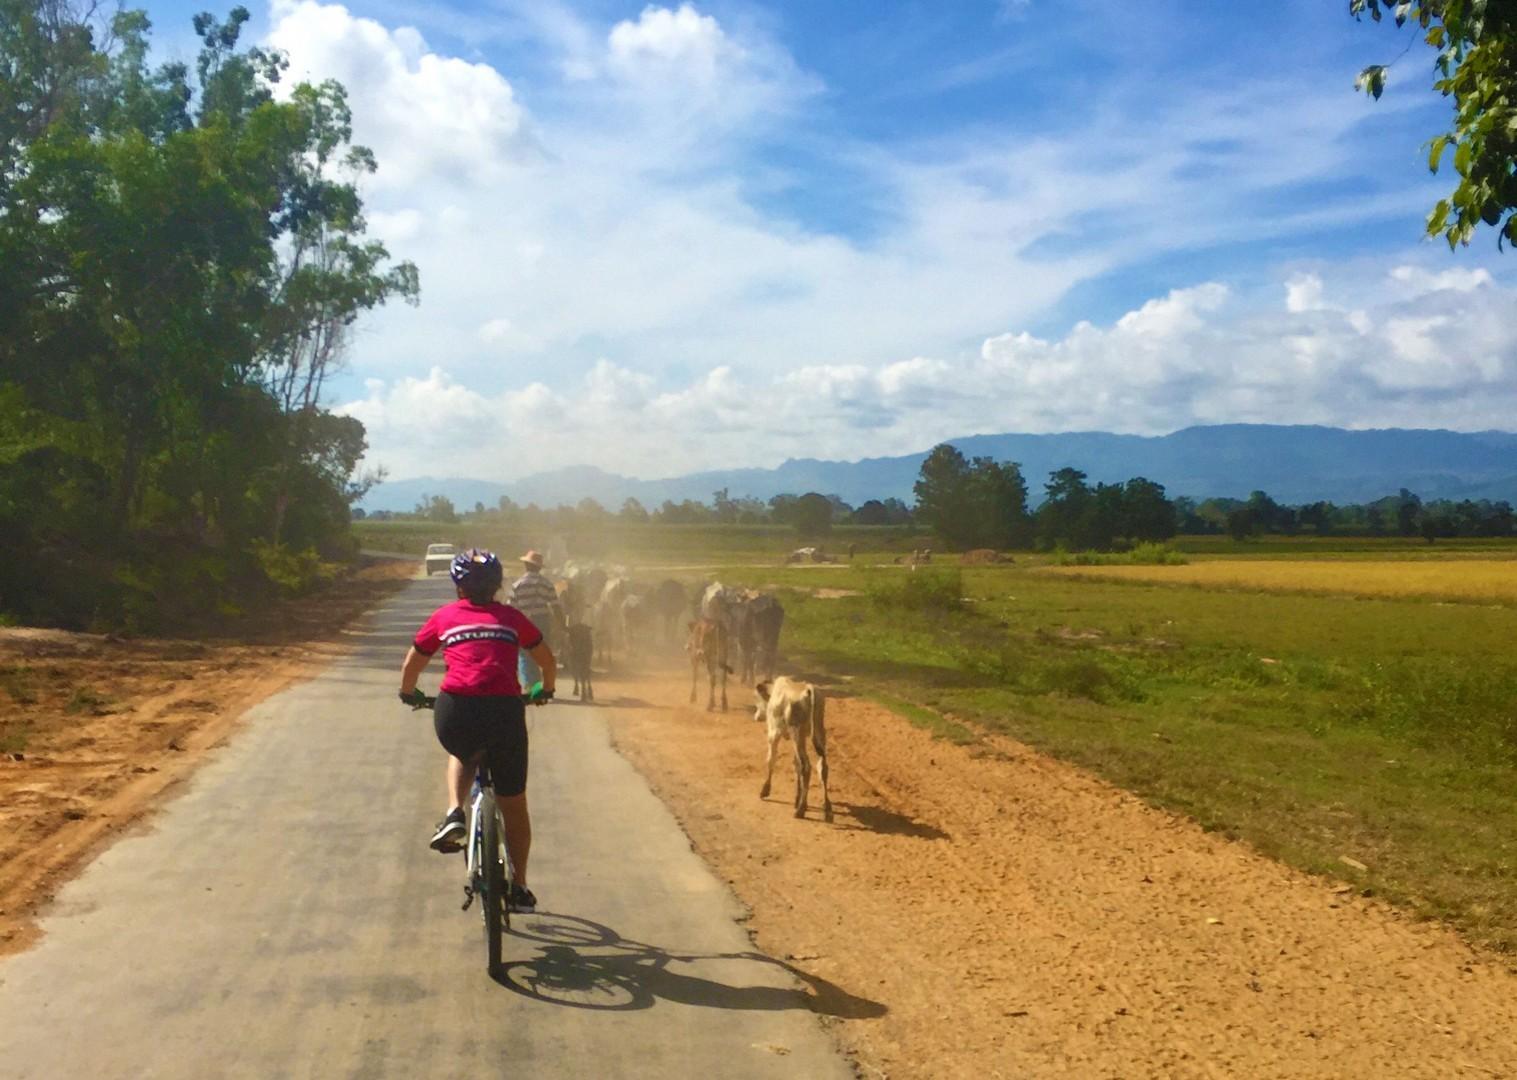 peaceful-group-cycling-countryside-burma.jpg - Myanmar (Burma) - Bagan and Beyond - Cycling Adventures